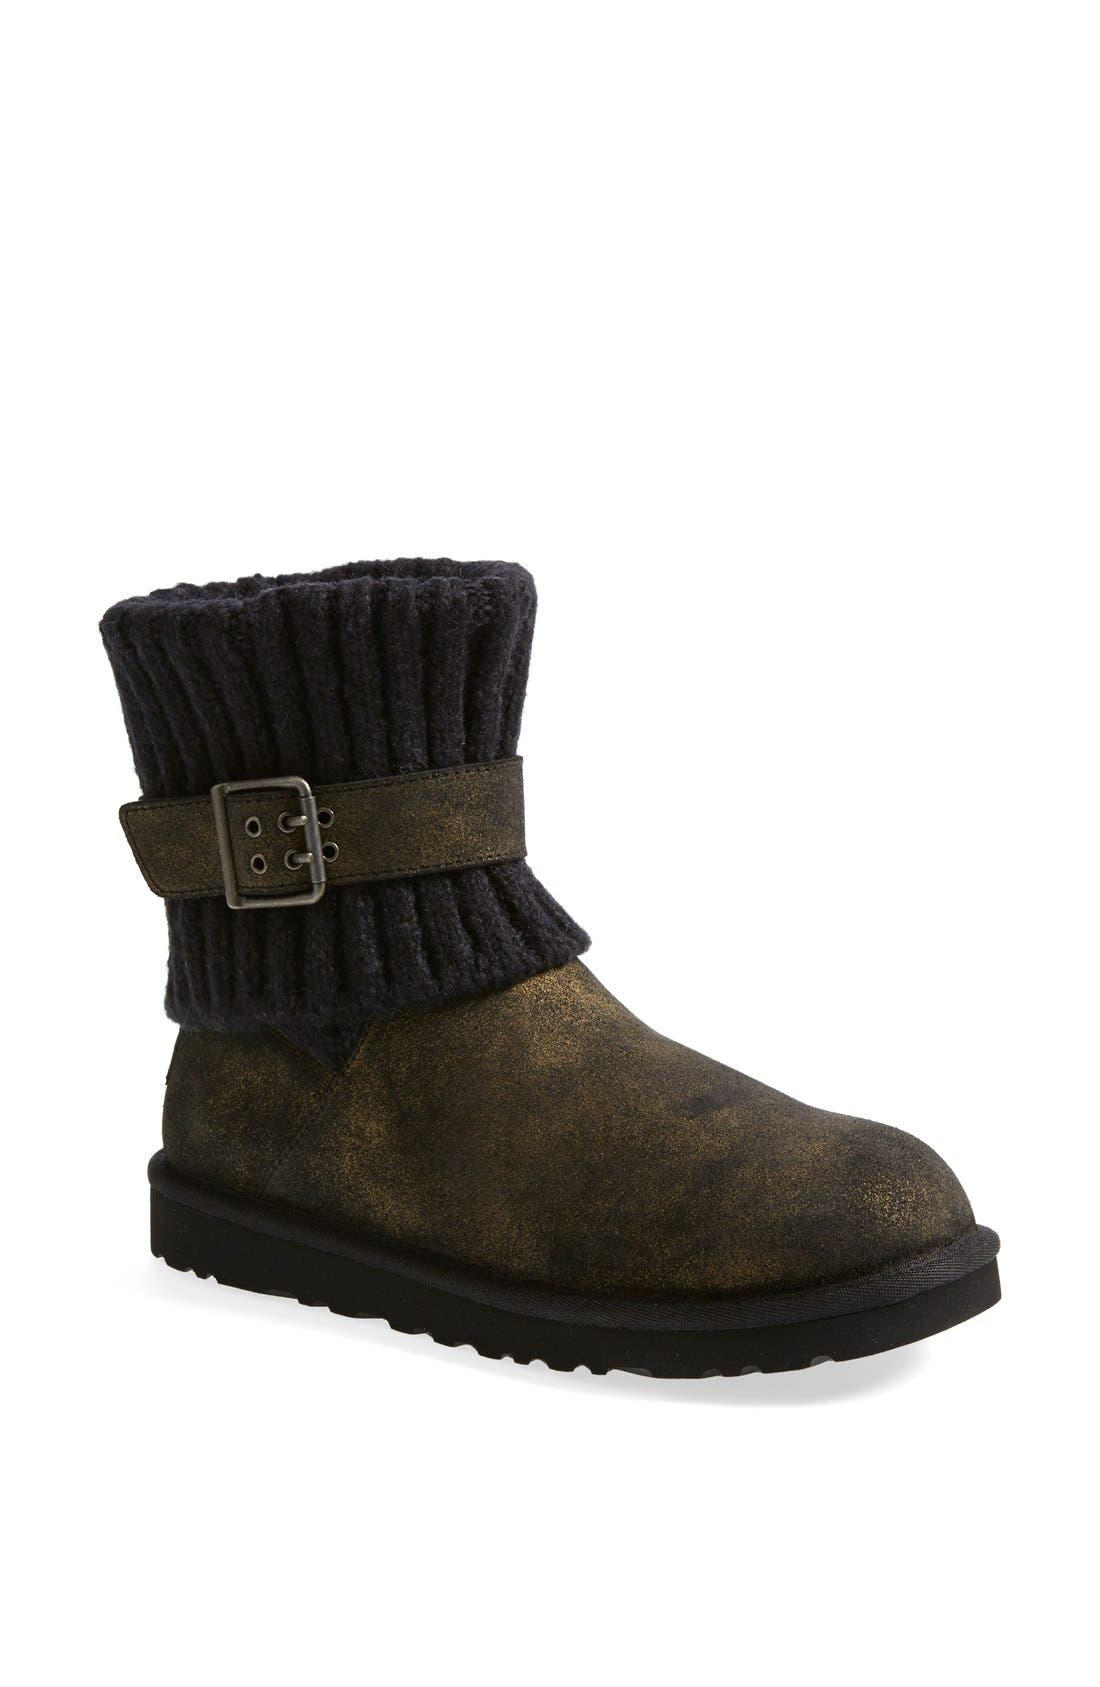 Main Image - UGG® Australia 'Cambridge' Boot (Women)